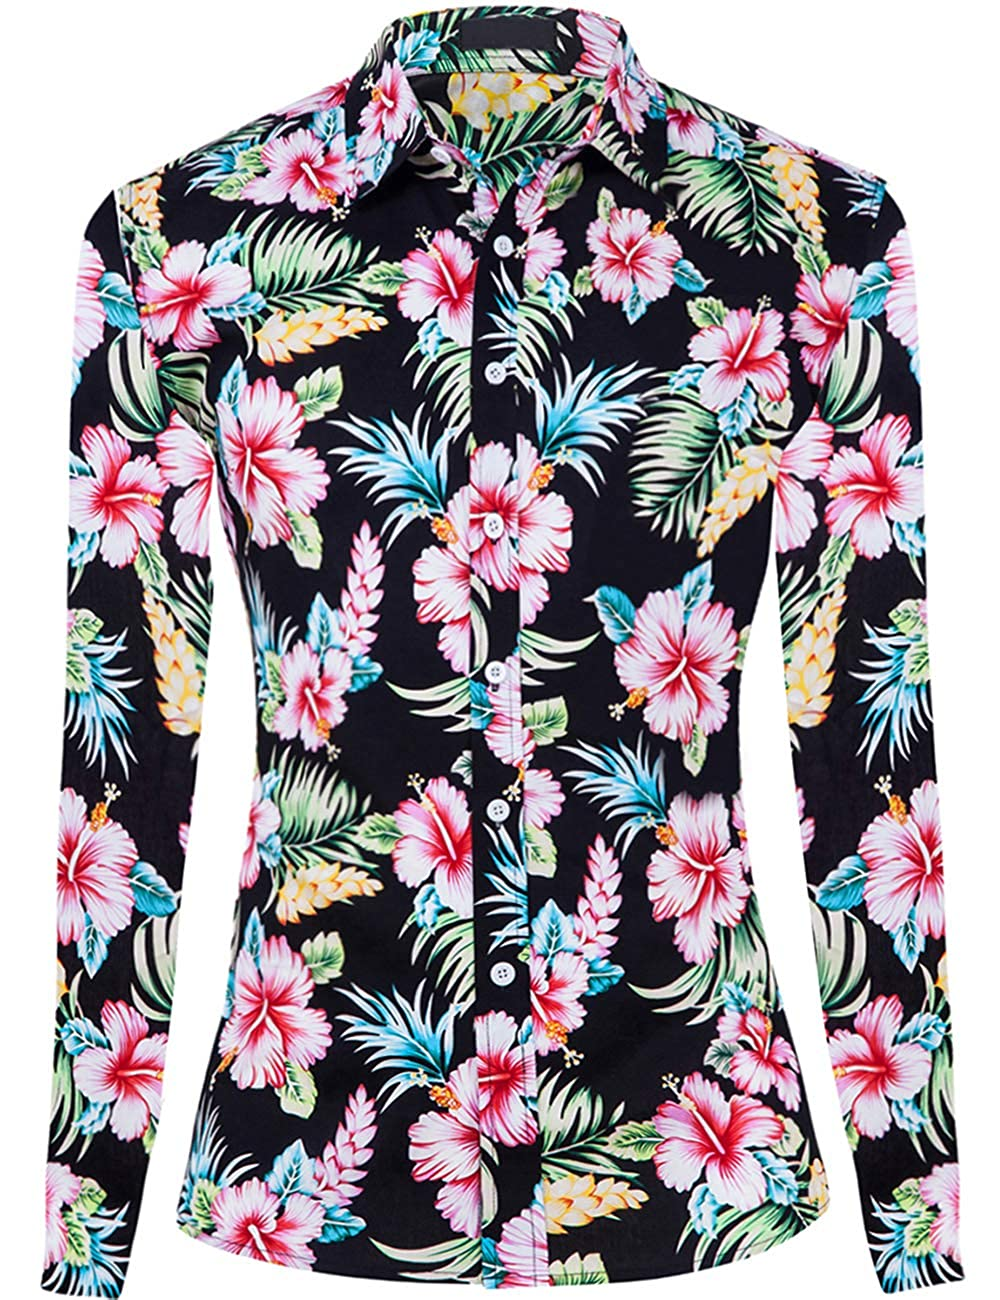 Amazon.com: DOKKIA Women's Tops Vintage Casual Shirts Cotton Long Sleeve  Work Button Up Dress Blouses: Clothing